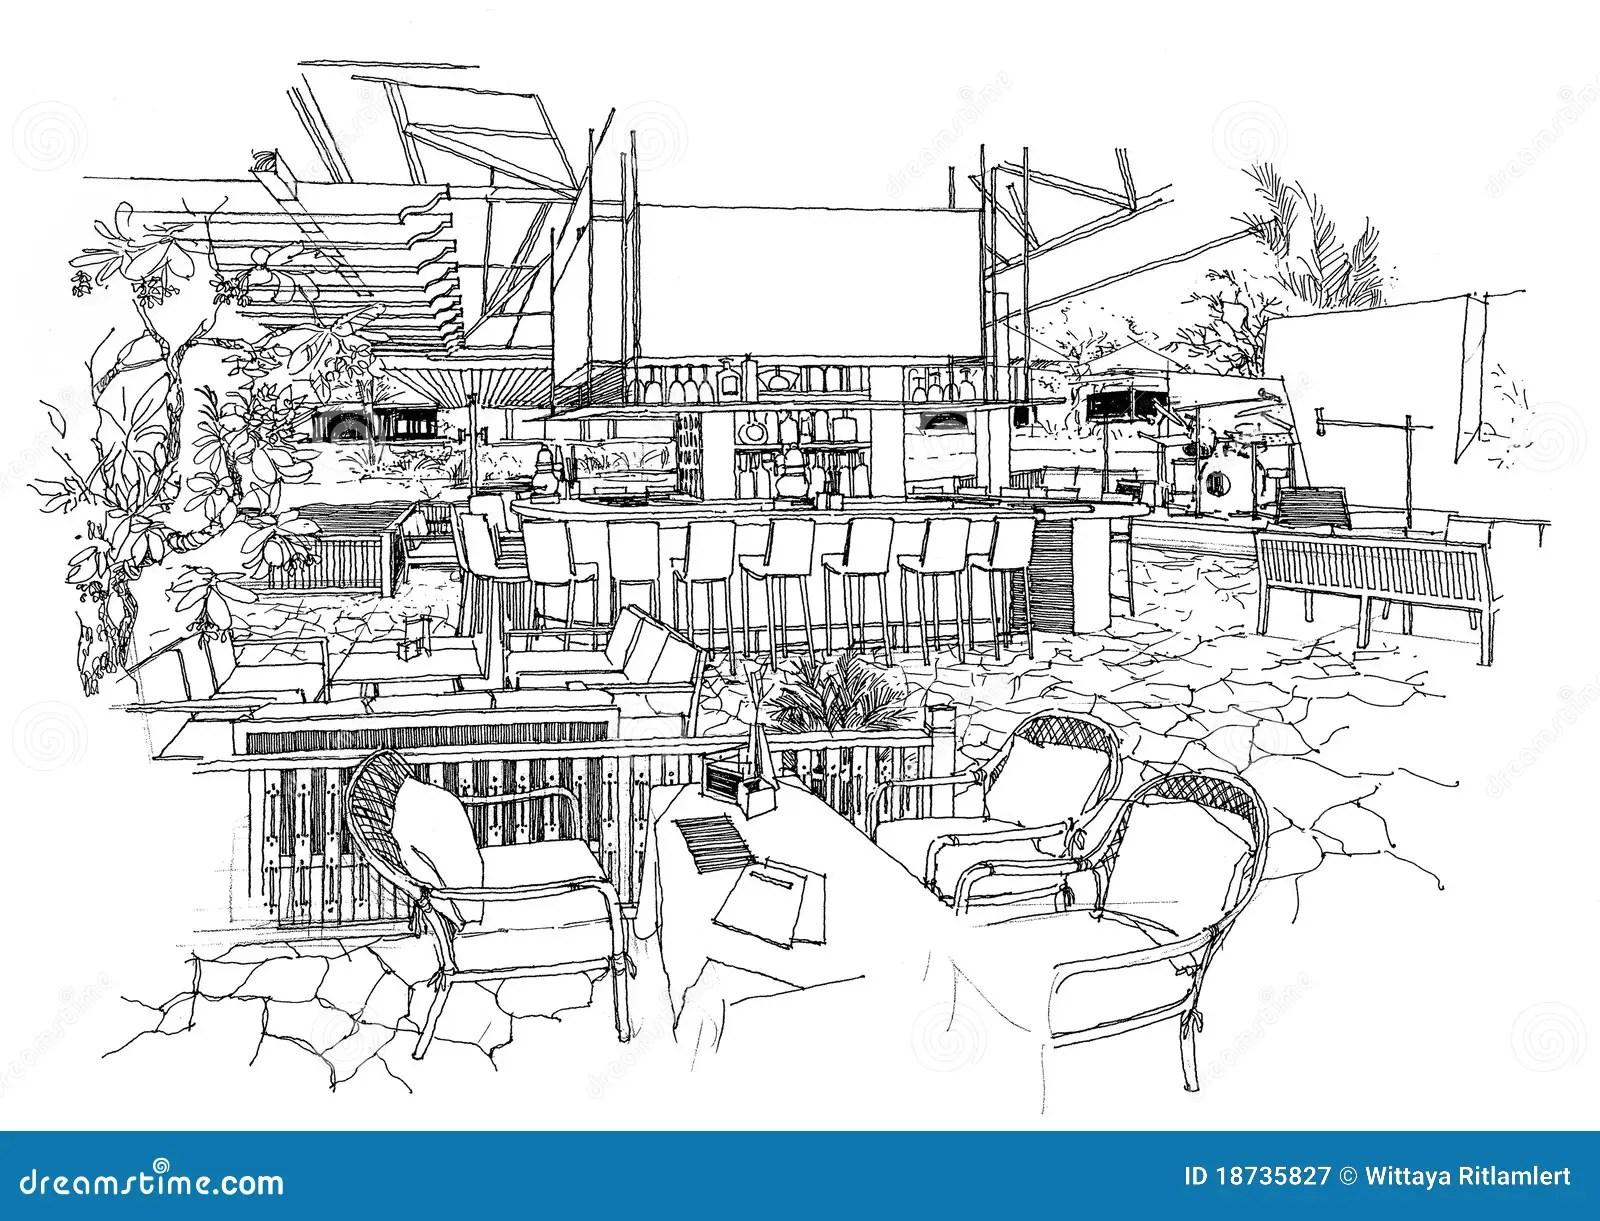 Interior Architecture Construction Landscape Sketch